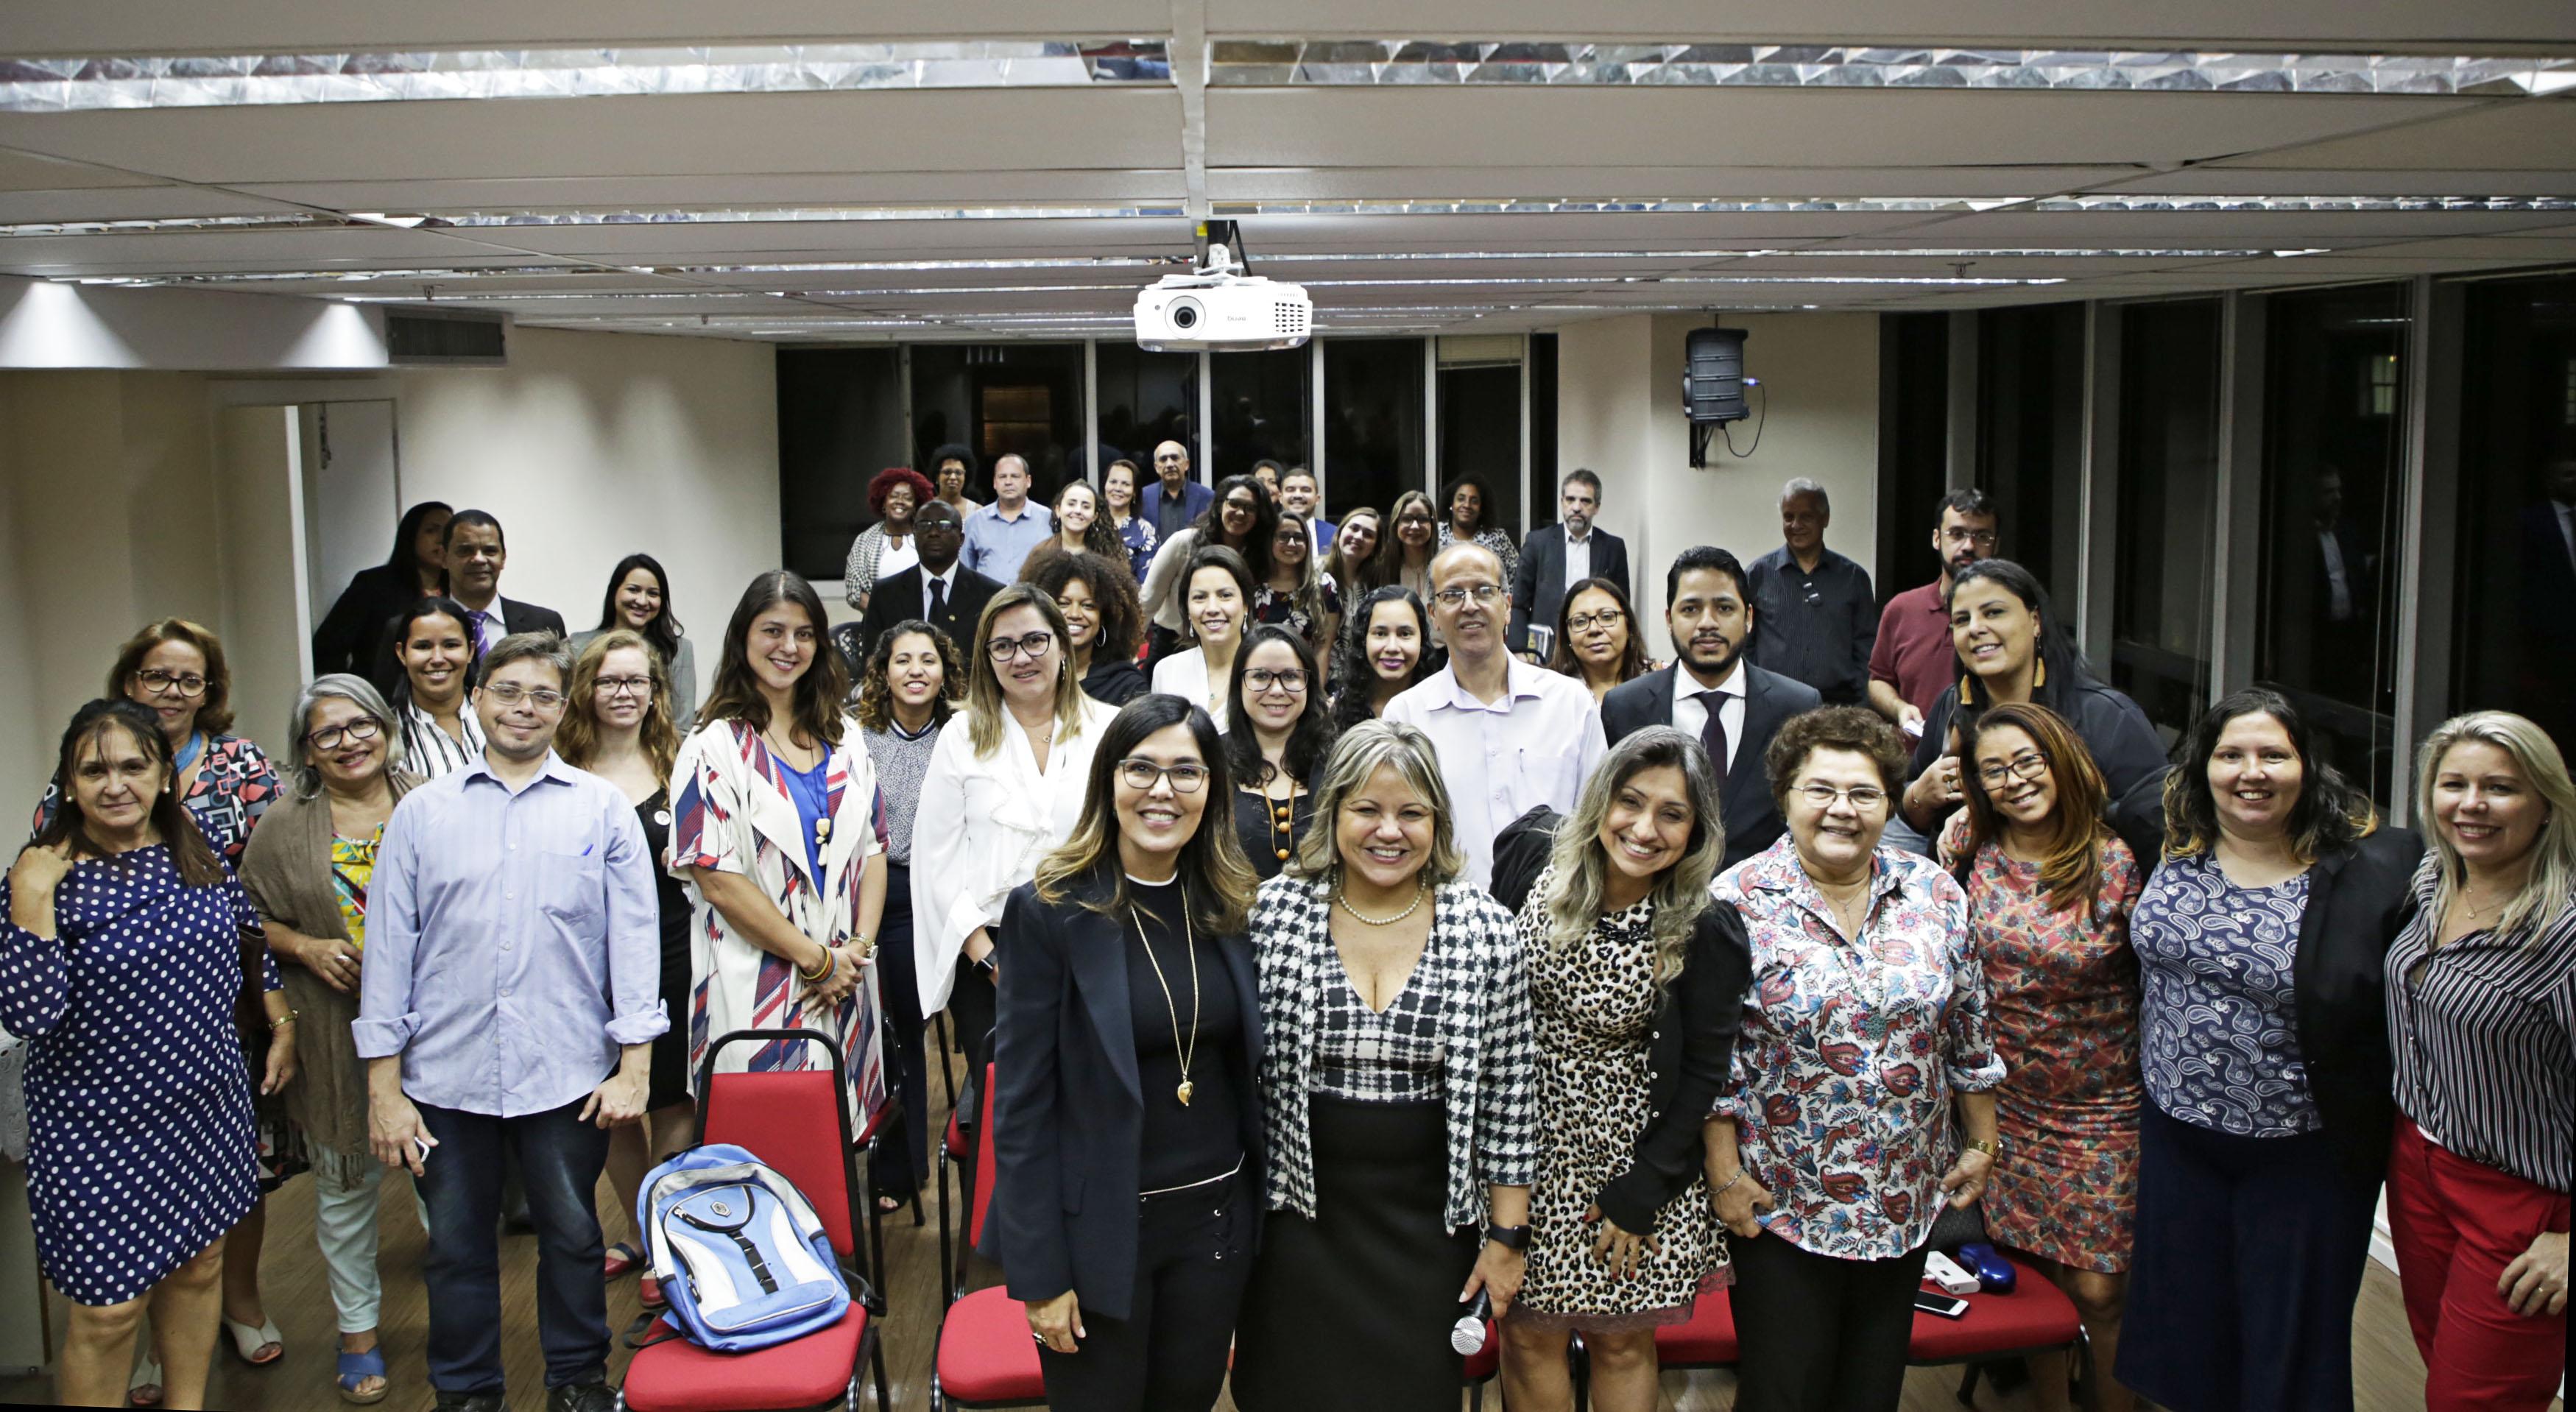 A Caarj Promove O Projeto Aperfeiçoando A Advocacia